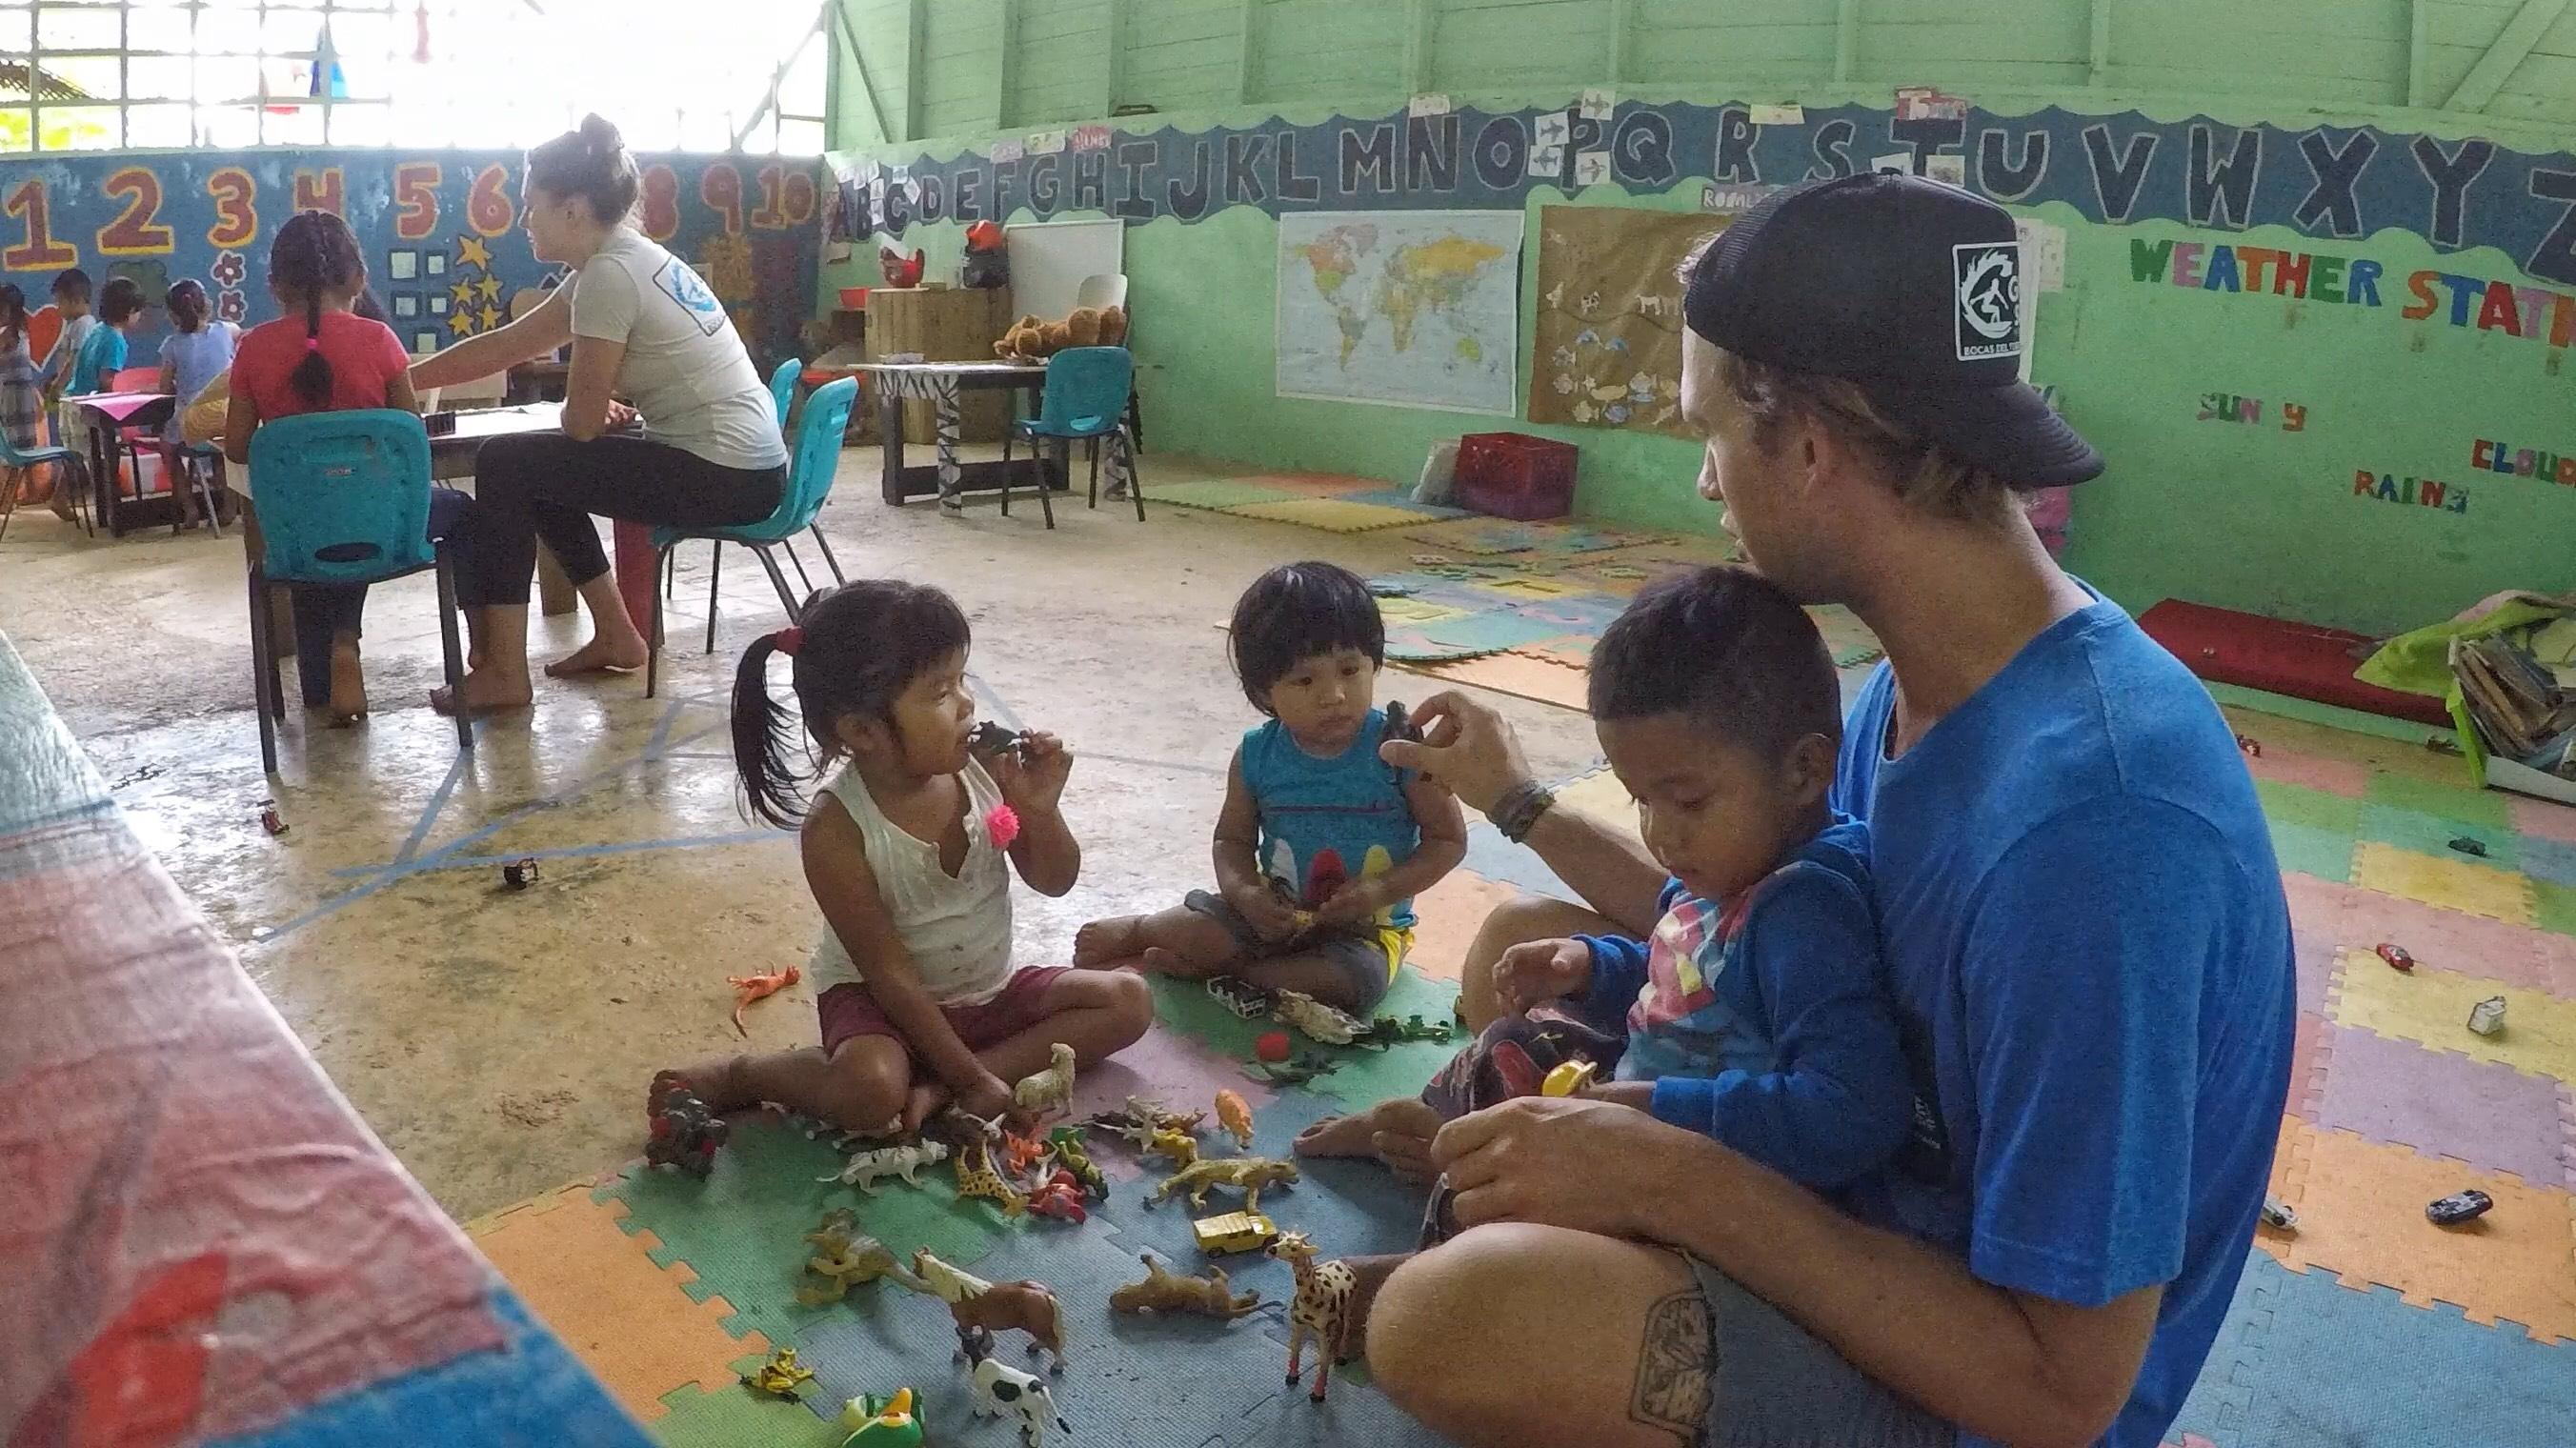 Zach in Panama